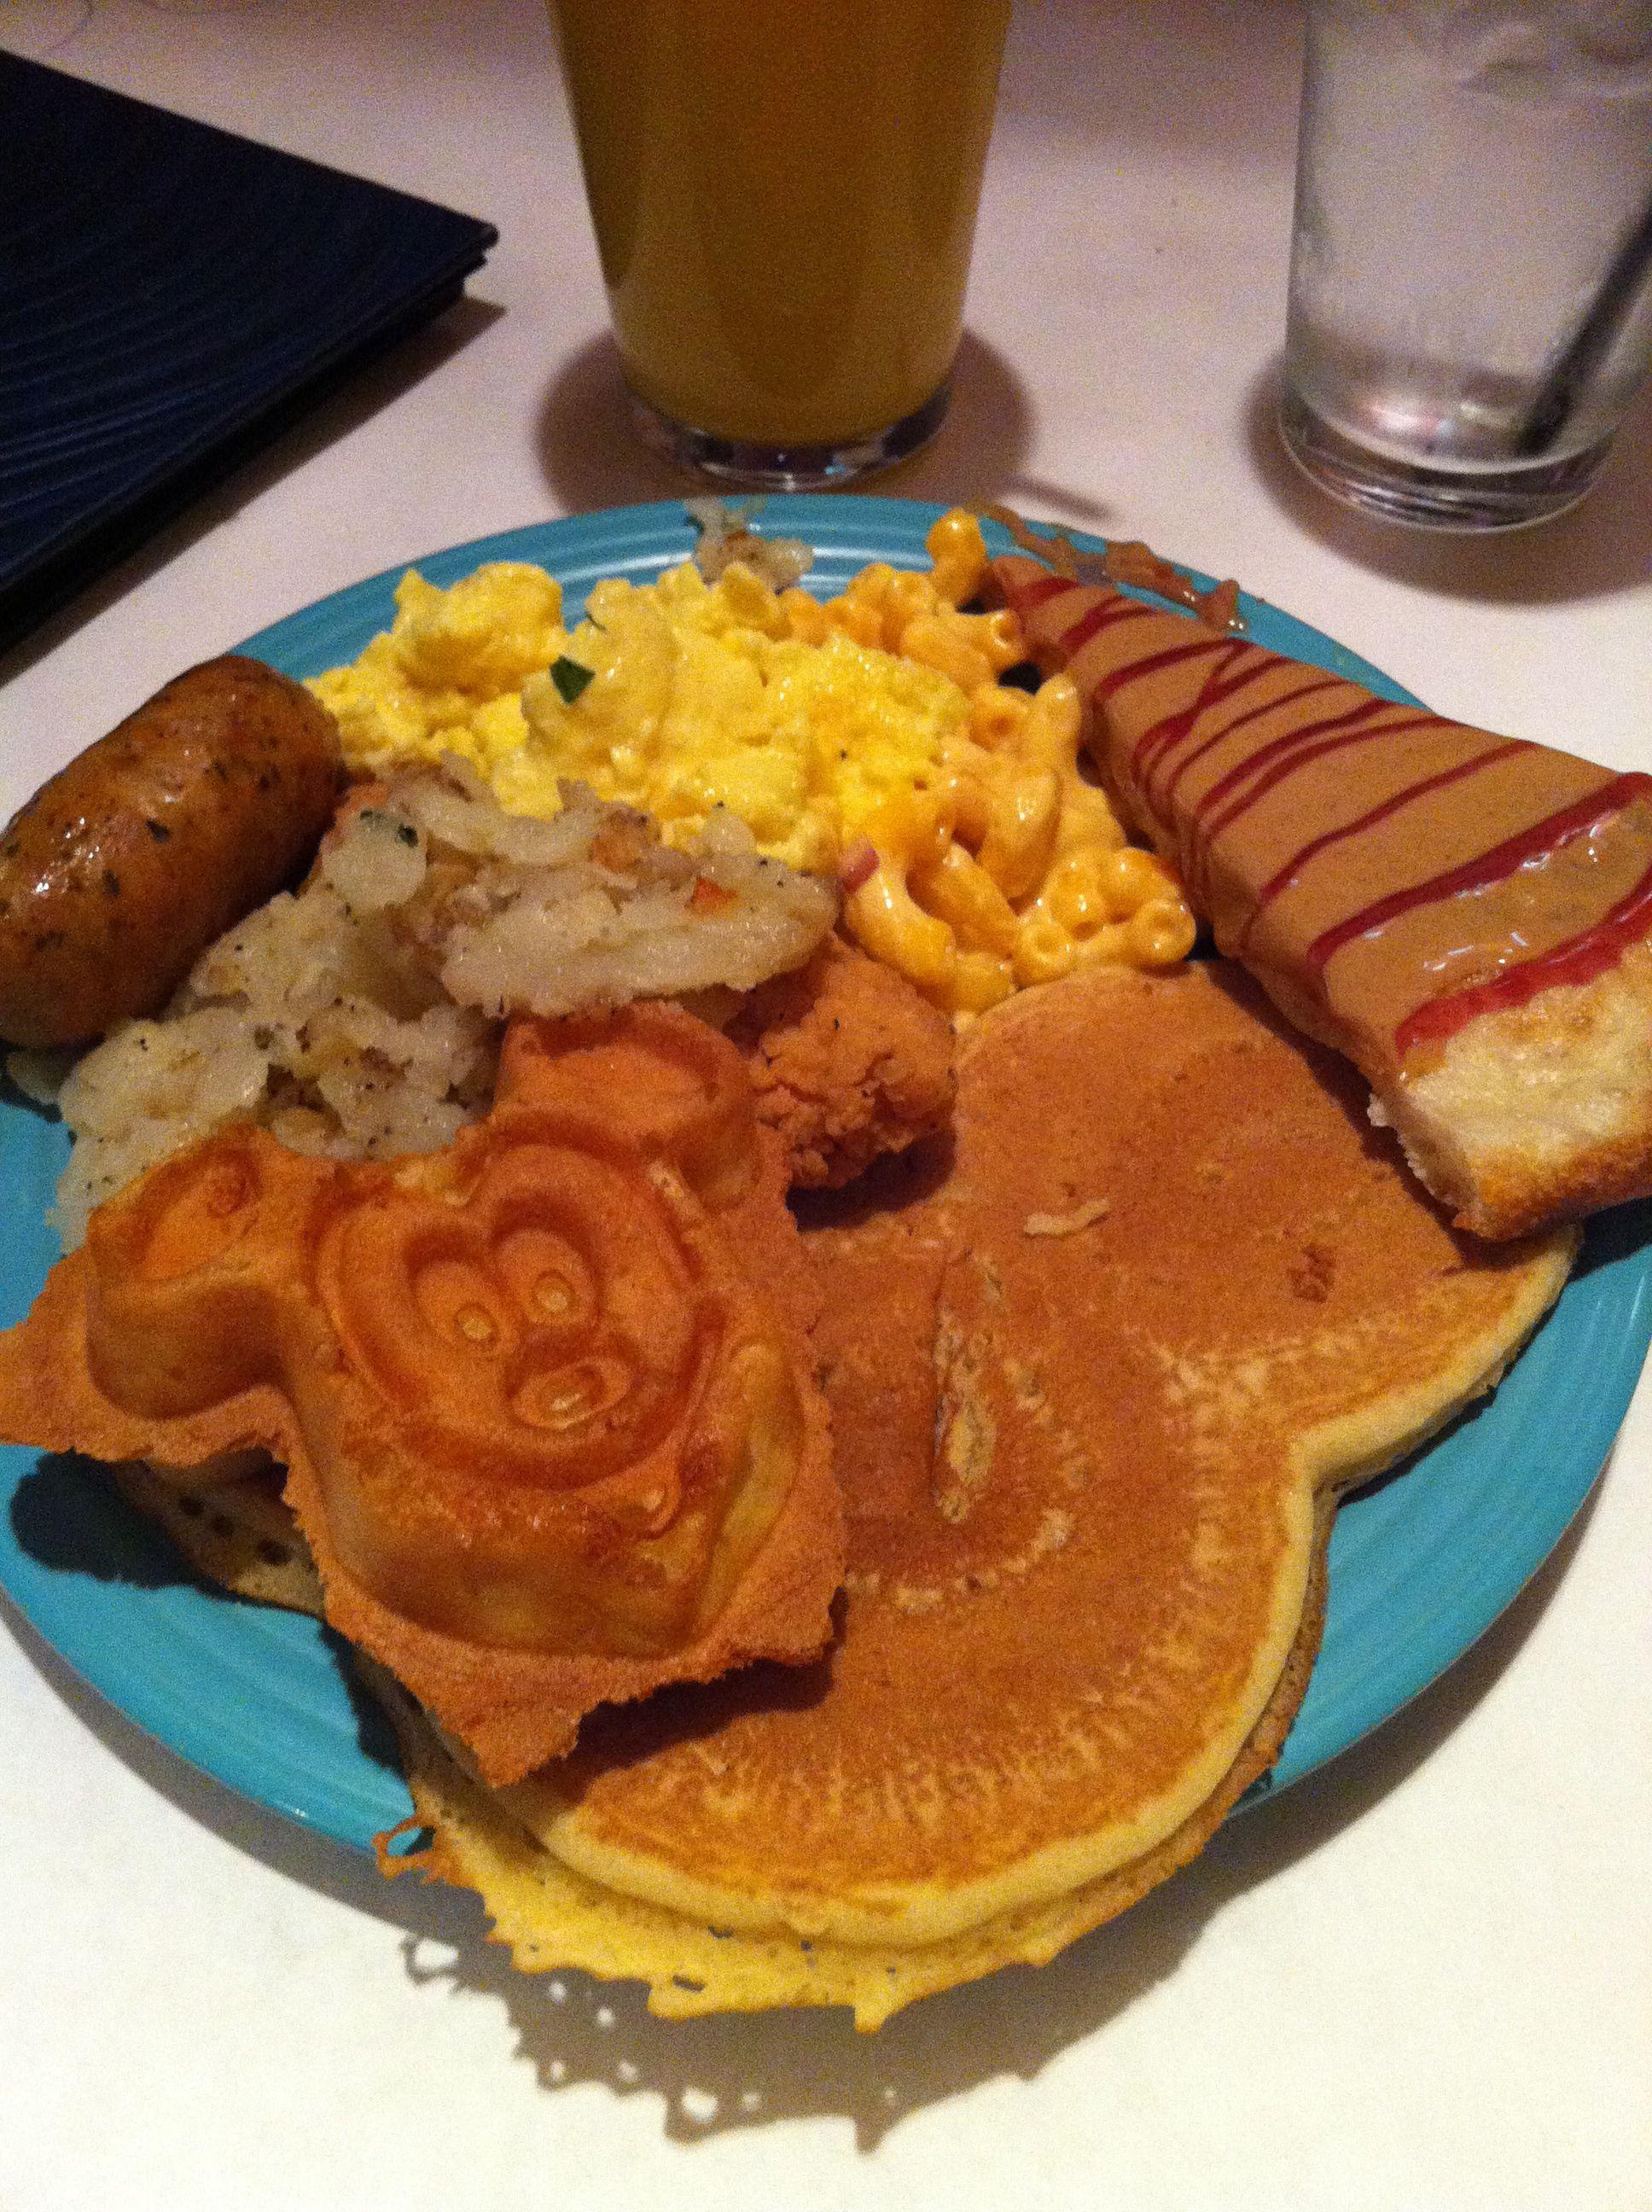 Goofy' Kitchen Breakfast Buffet Disneyland Hotel